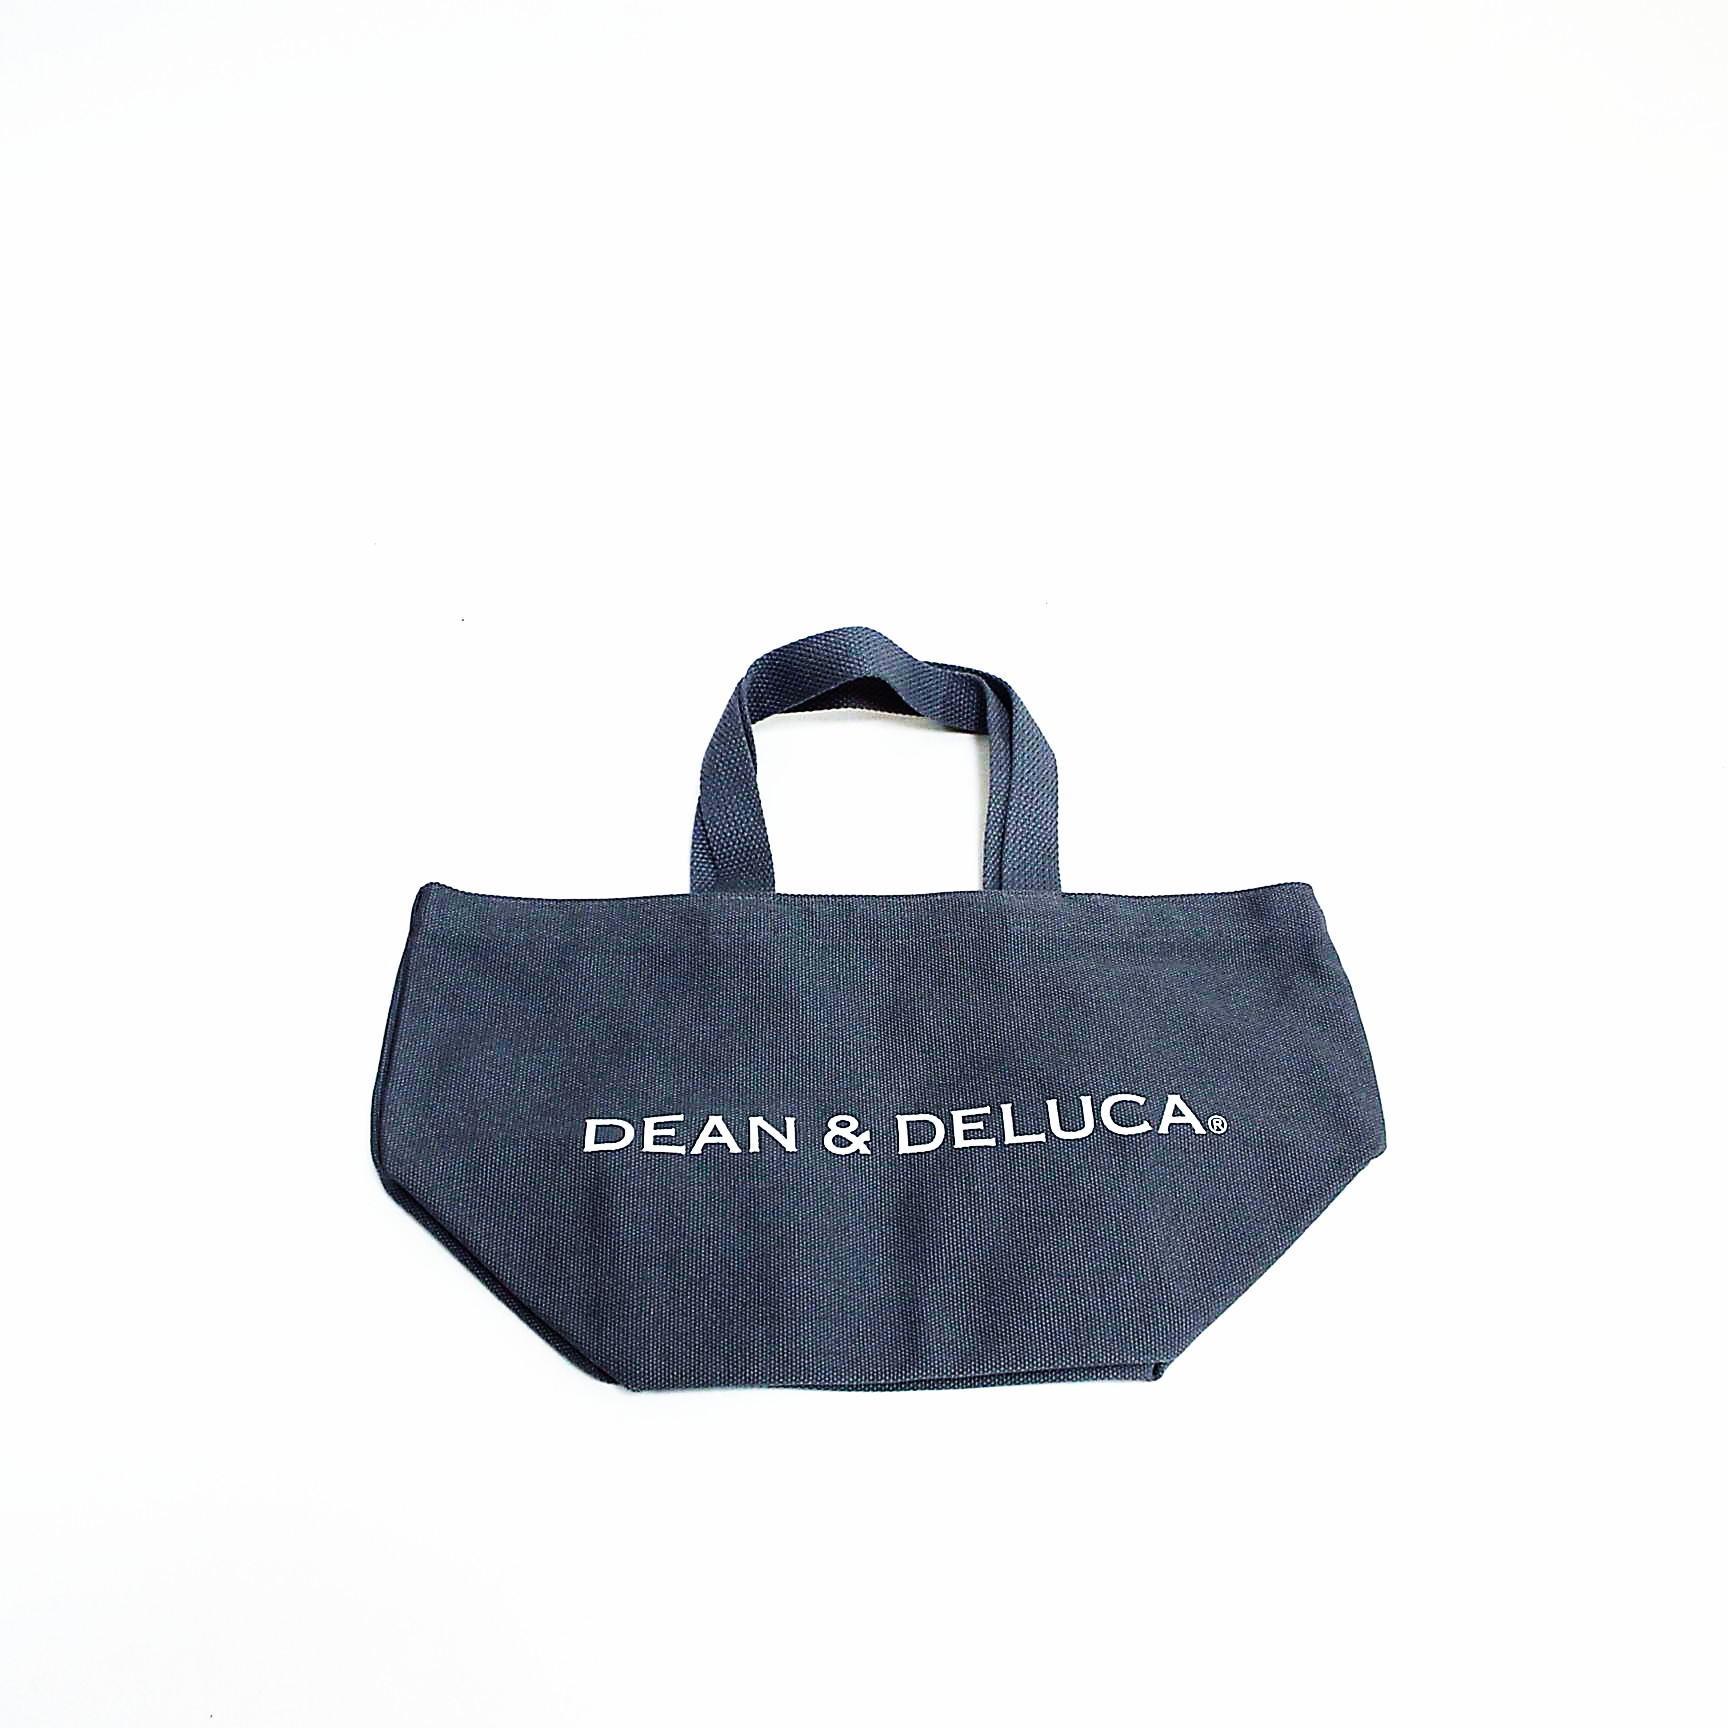 DEAN&DELUCA トートバック グレー Sサイズ